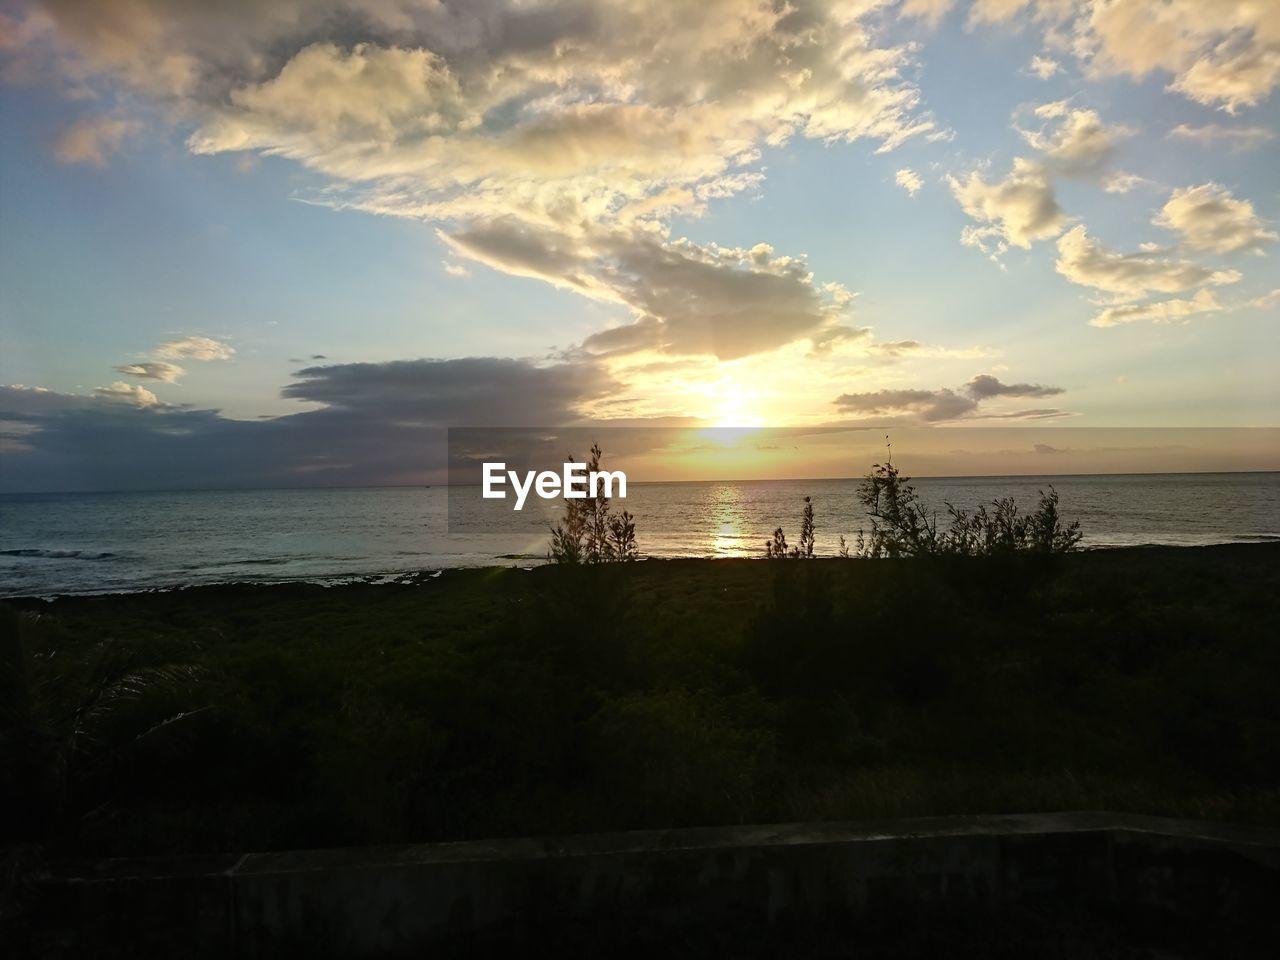 water, sky, sea, cloud - sky, scenics - nature, beauty in nature, sunset, tranquility, tranquil scene, horizon over water, horizon, beach, land, nature, idyllic, no people, non-urban scene, outdoors, plant